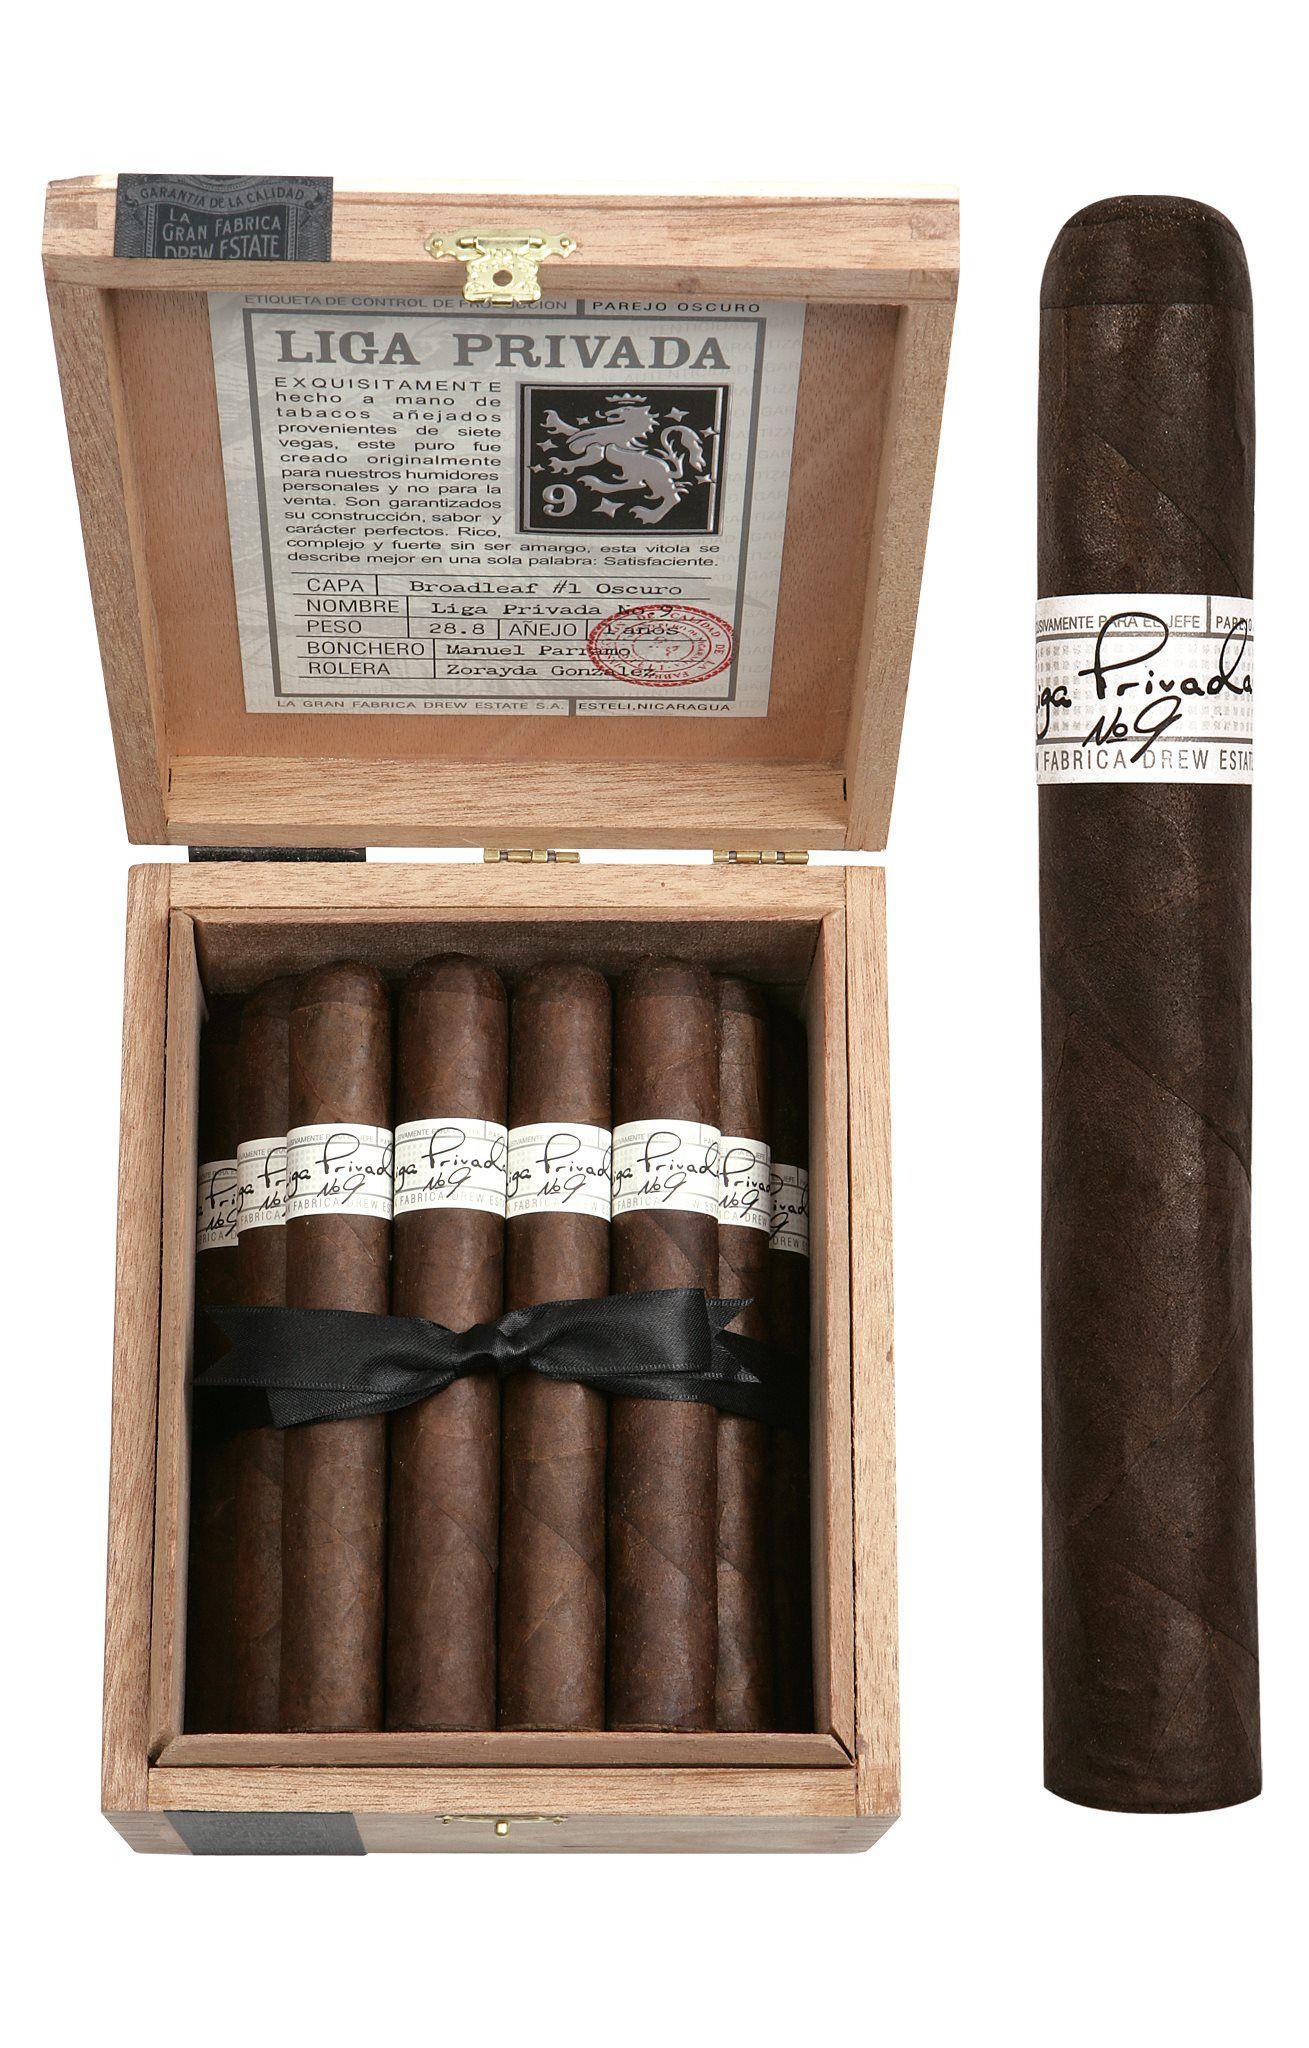 Drew Estates Cigars Great Smokes | Cigar stuff | Pinterest ...